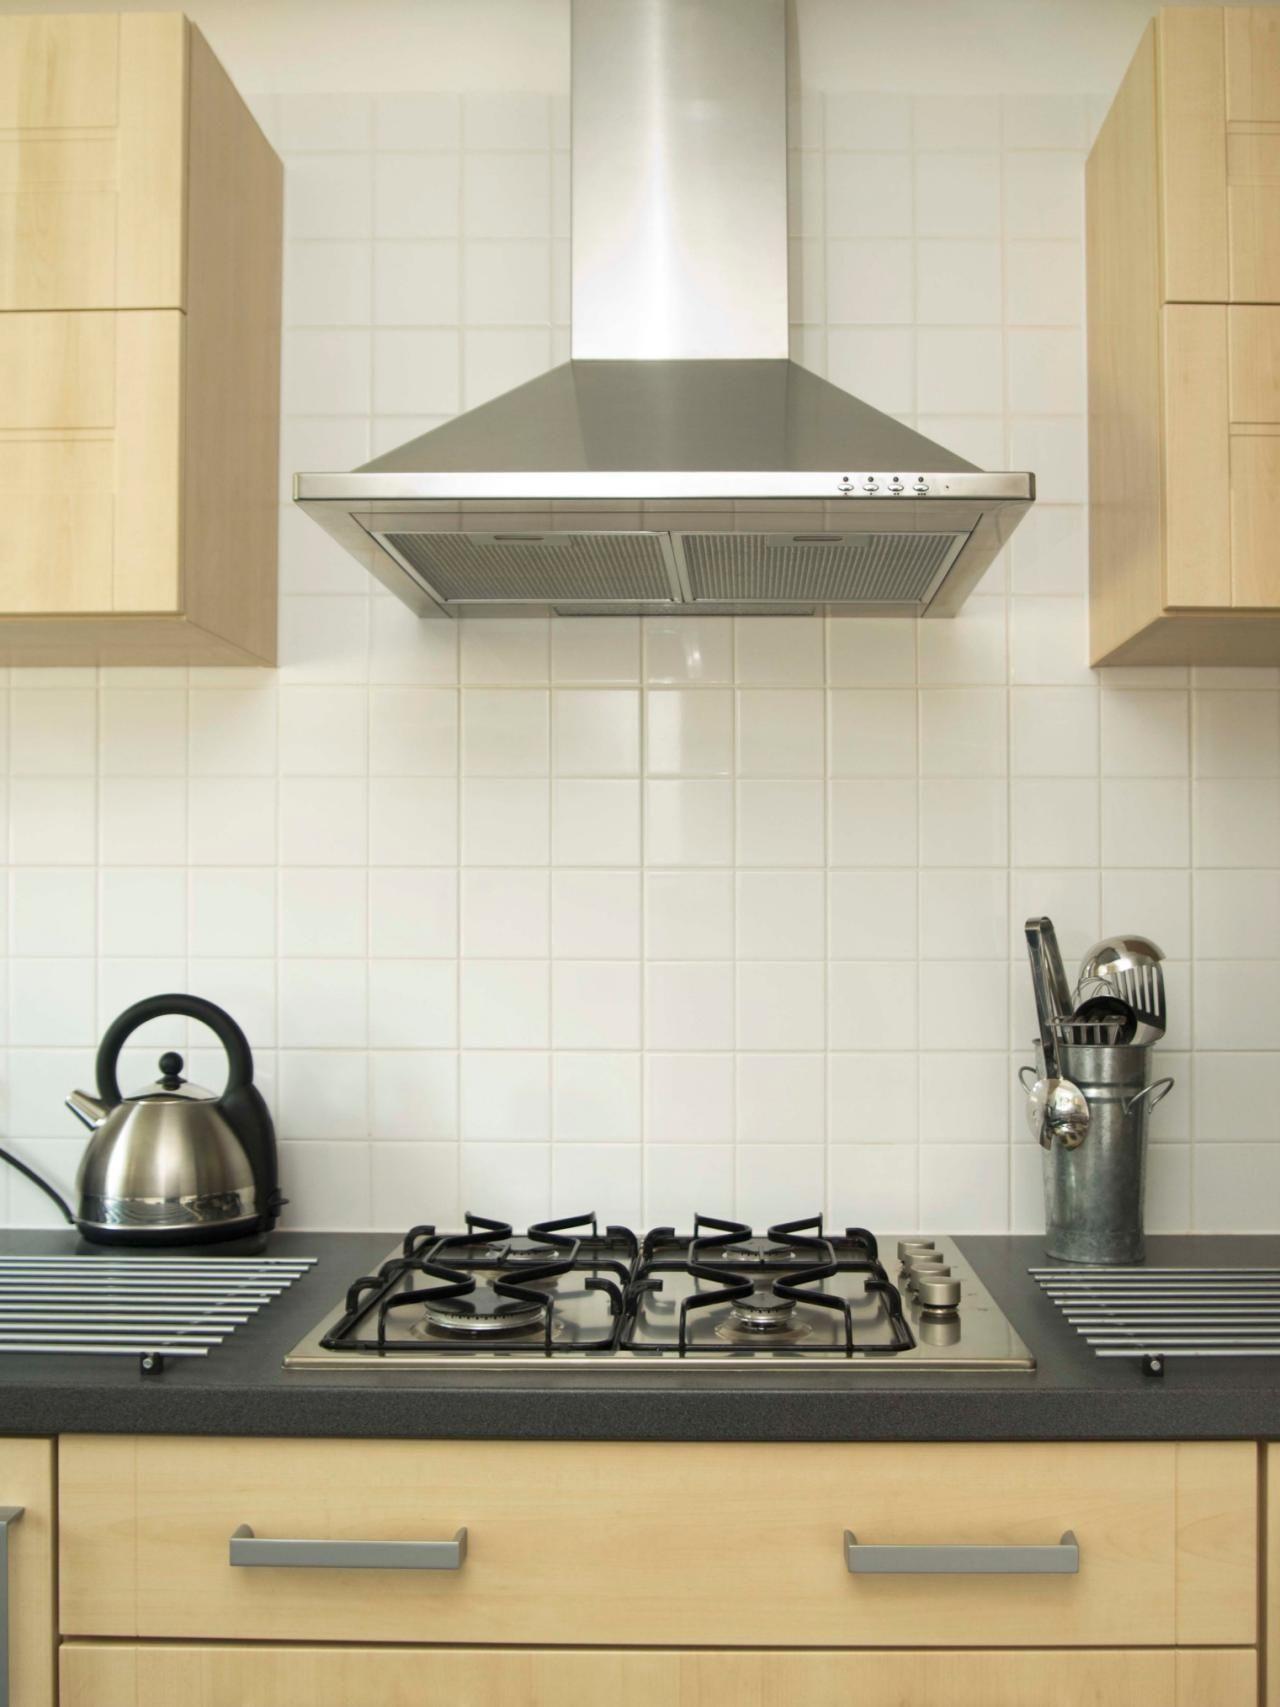 Best Kitchen Gallery: Kitchen Ventilation Systems Application Design Guide of Grease Duct Kitchen Hood Design on rachelxblog.com